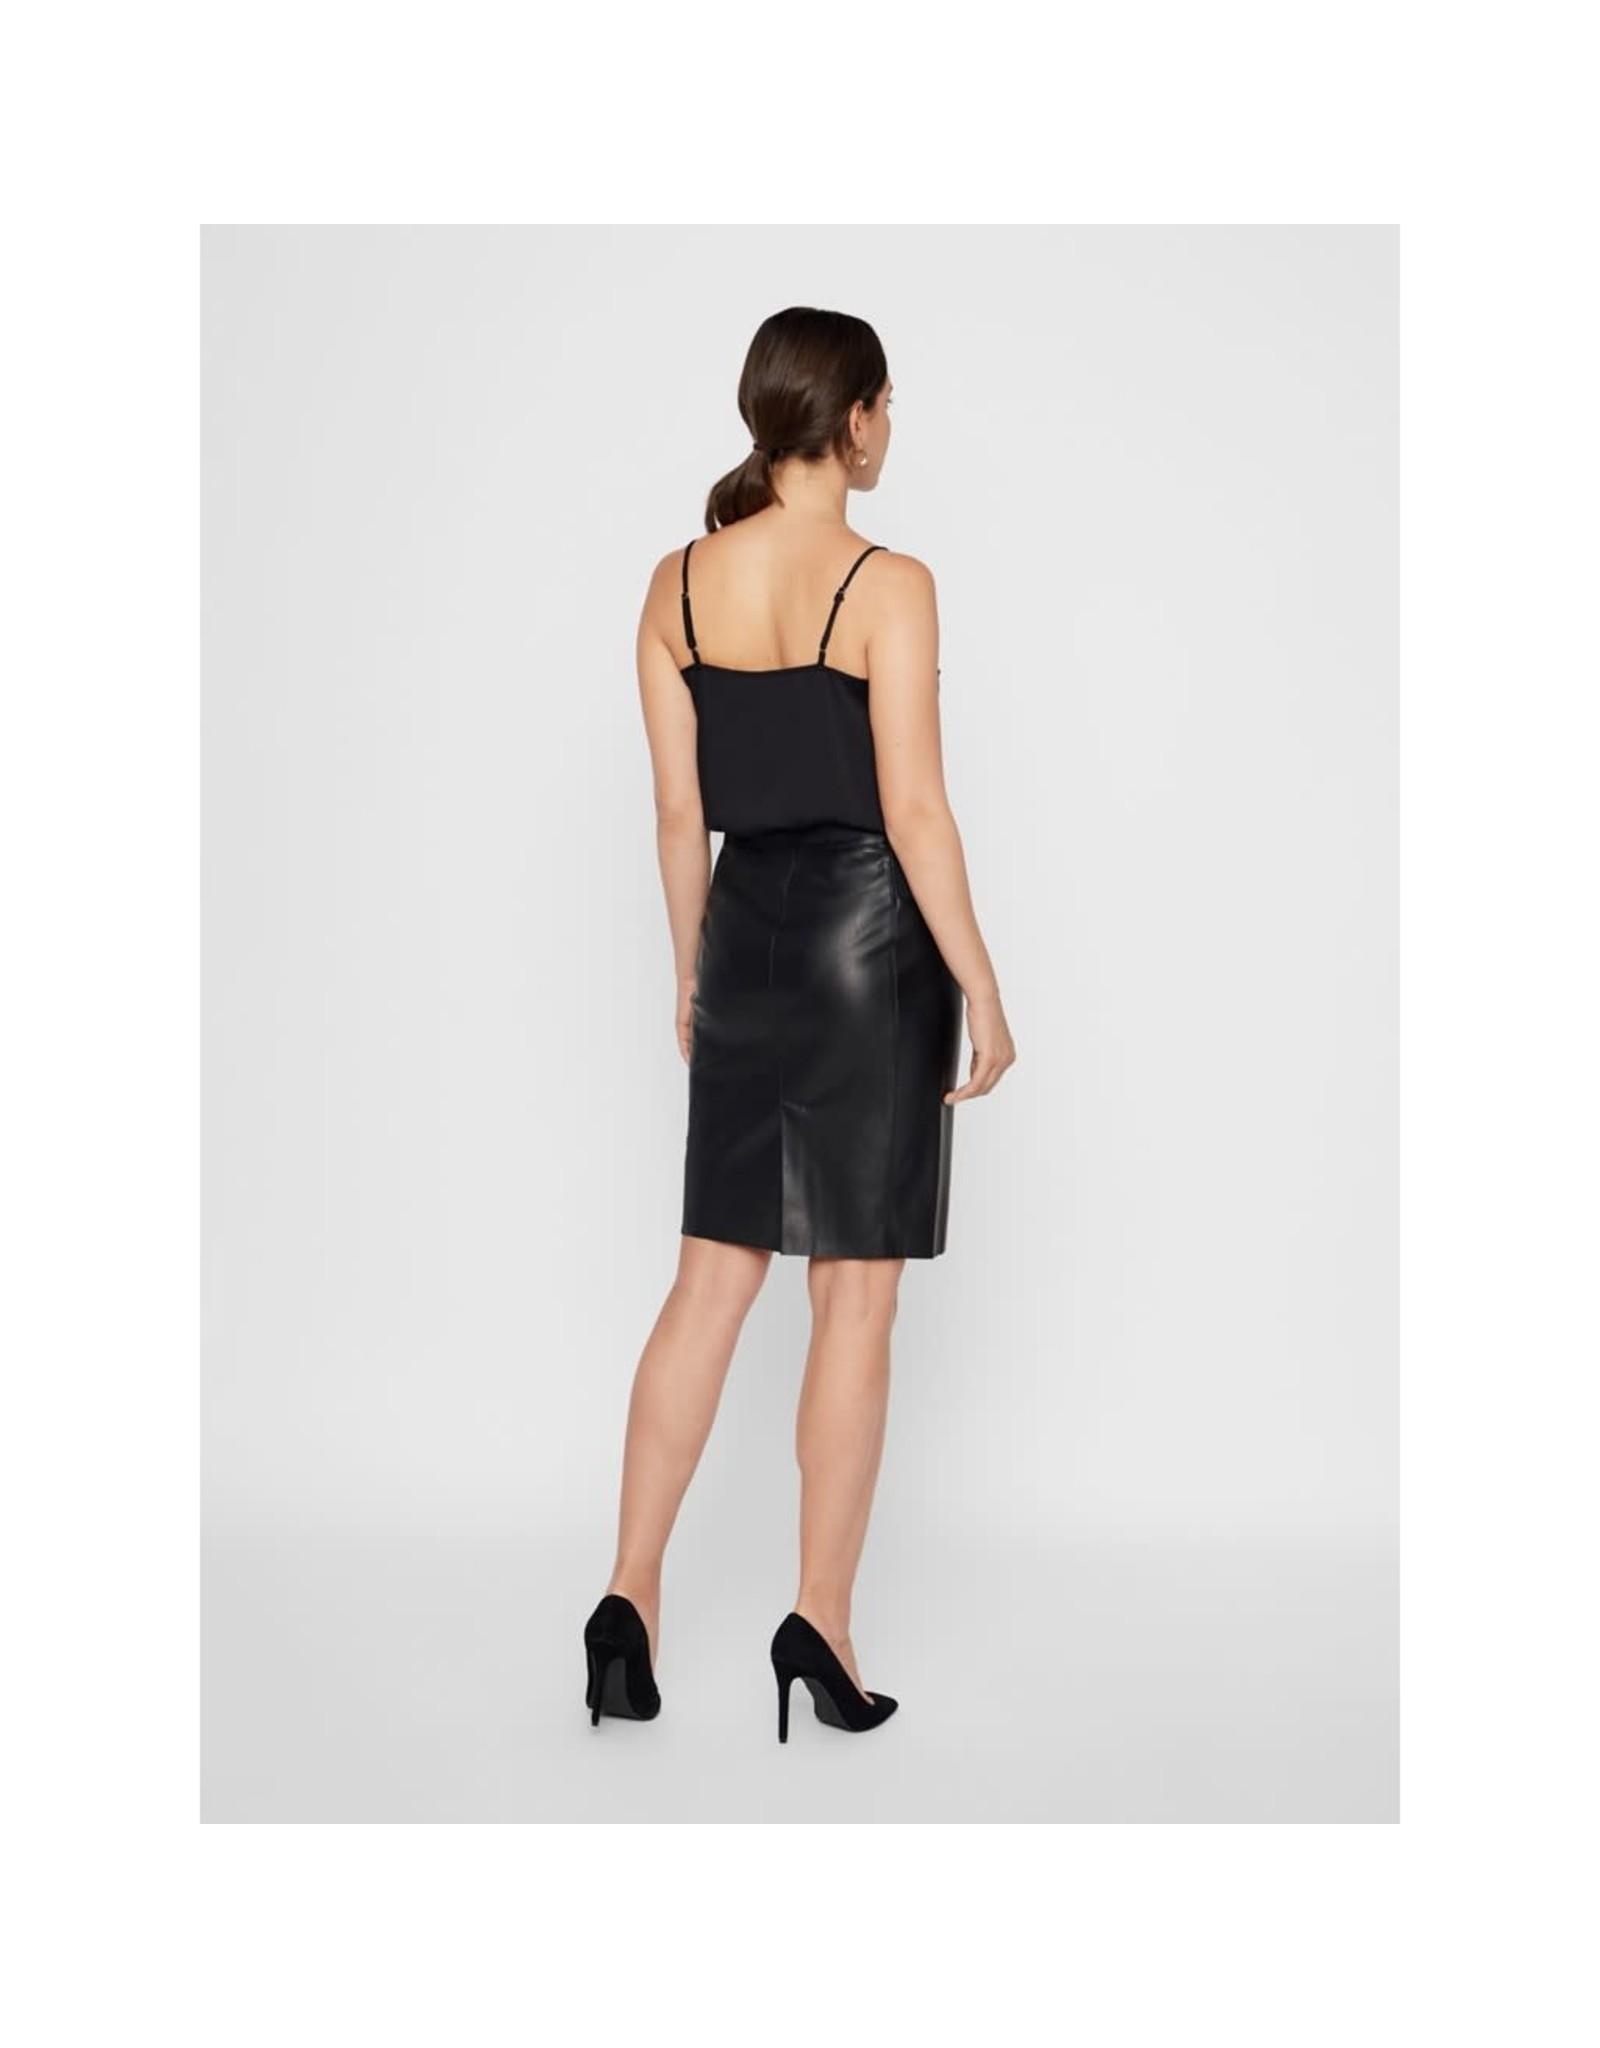 Vero Moda Vero Moda - High Waisted Faux Leather Skirt